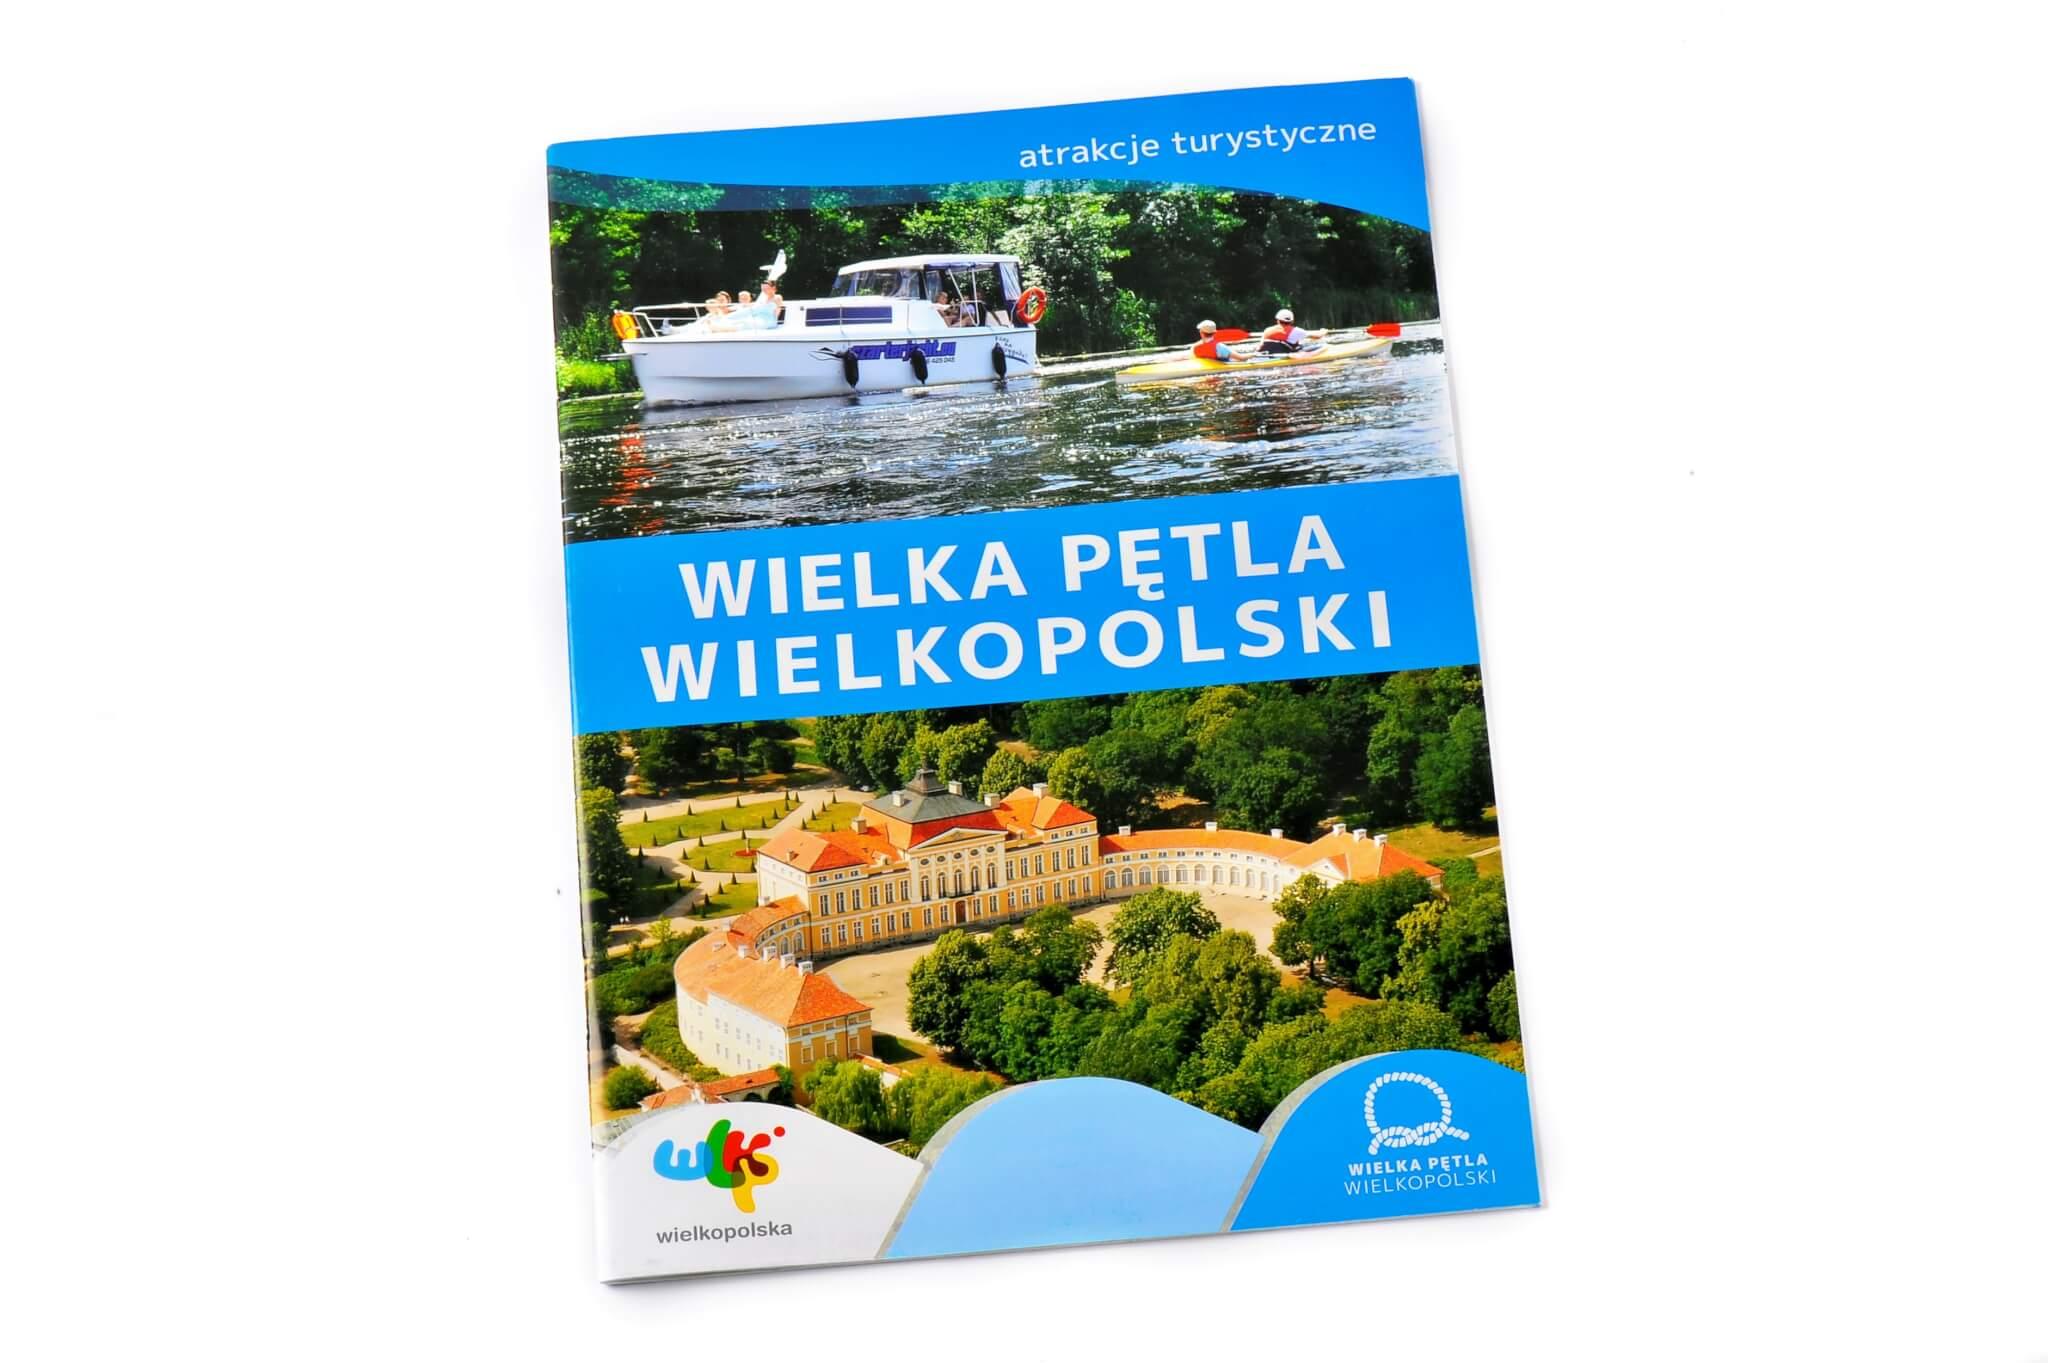 Wielka<br>Pętla Wielkopolski